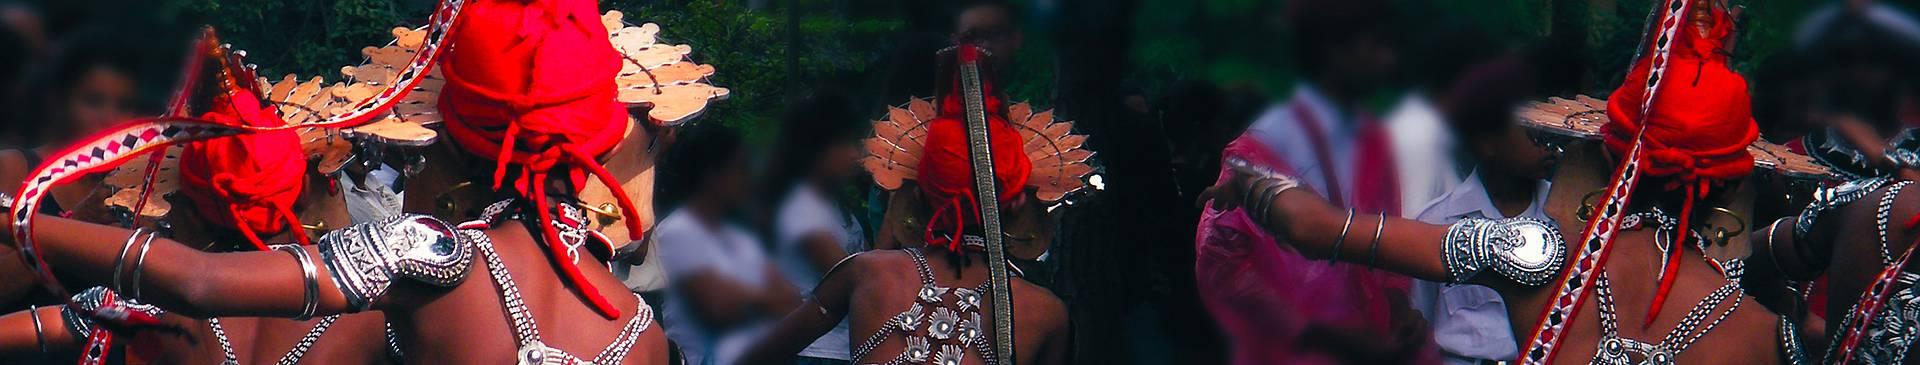 Sri Lanka famous festivals